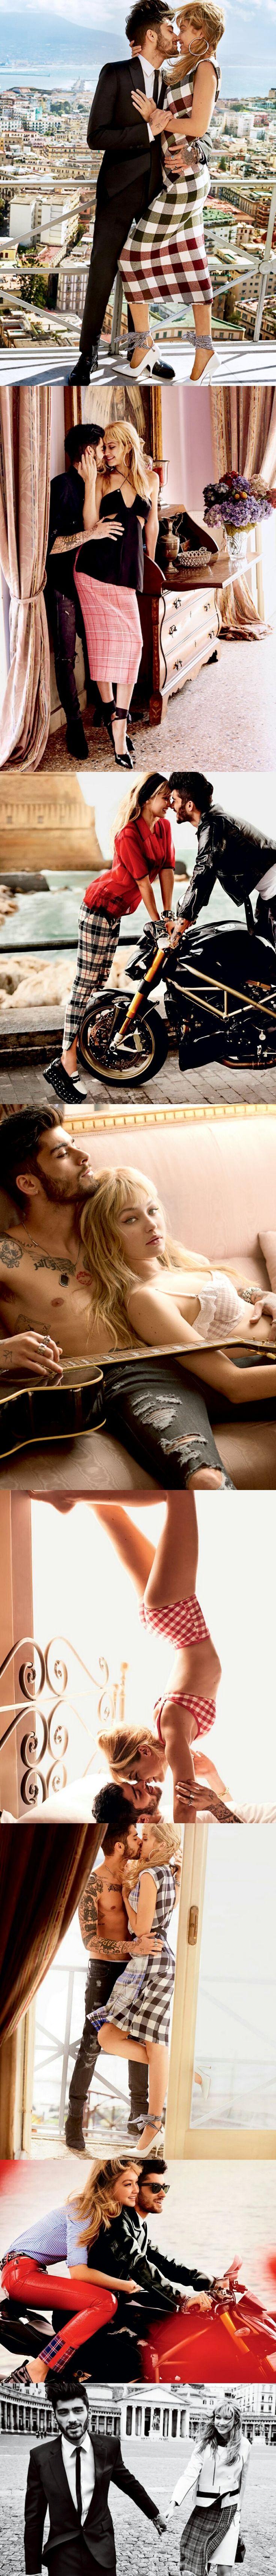 Zayn Malik and #Gigi Hadid for Vogue US .  Pictures - Mario Testino © #Zayn Malik